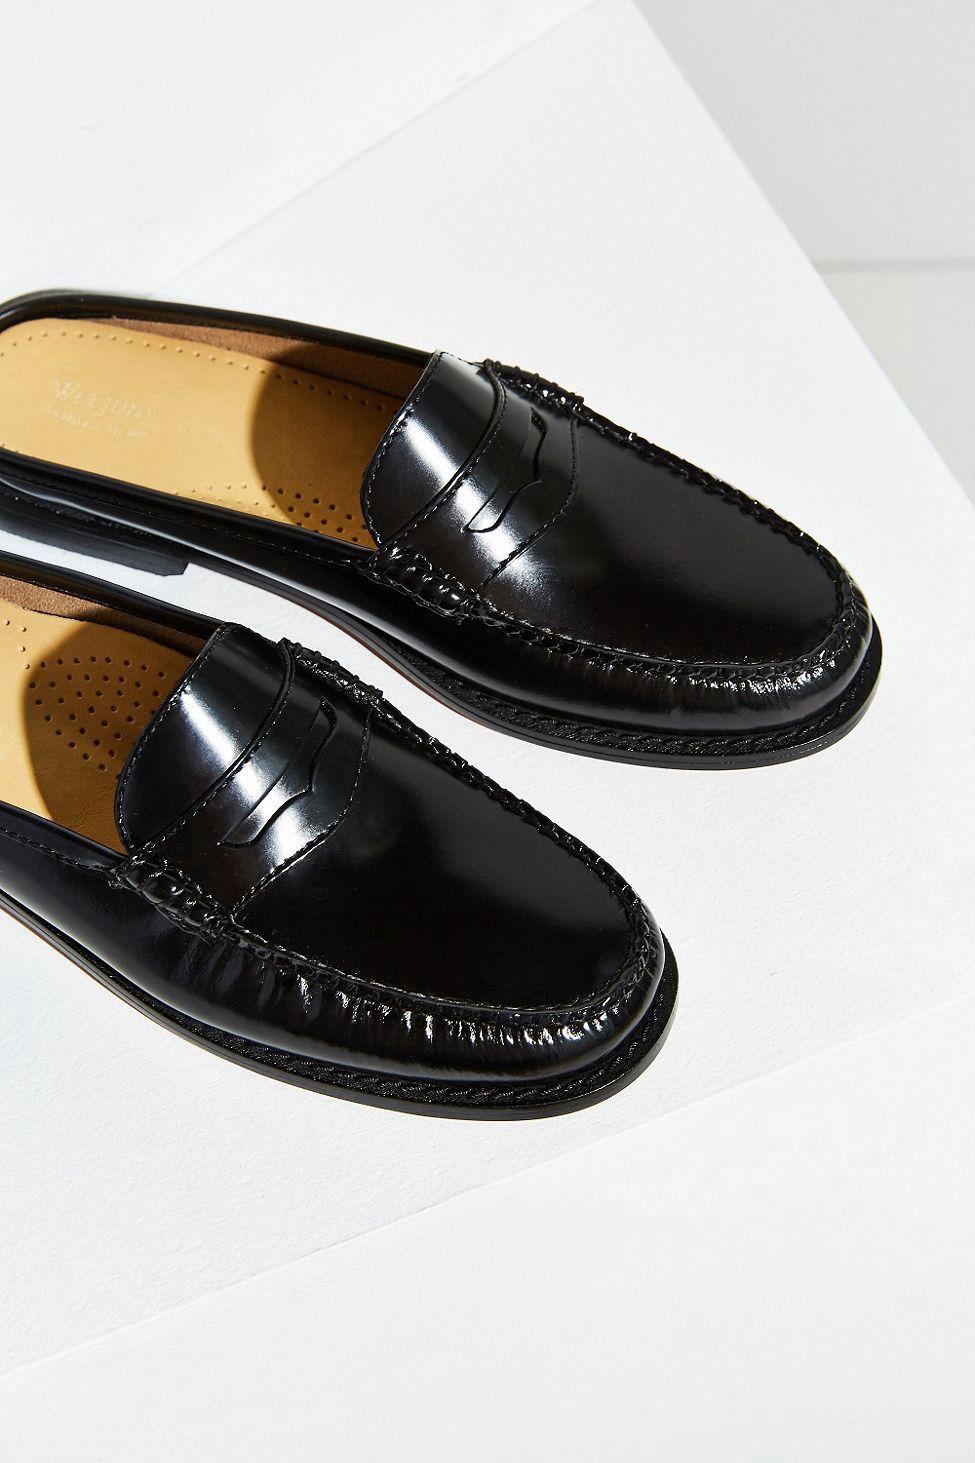 3b0f7bb6686 Urban Outfitters Bass Wynn Mule - Black 7.5 Fall Winter Shoes